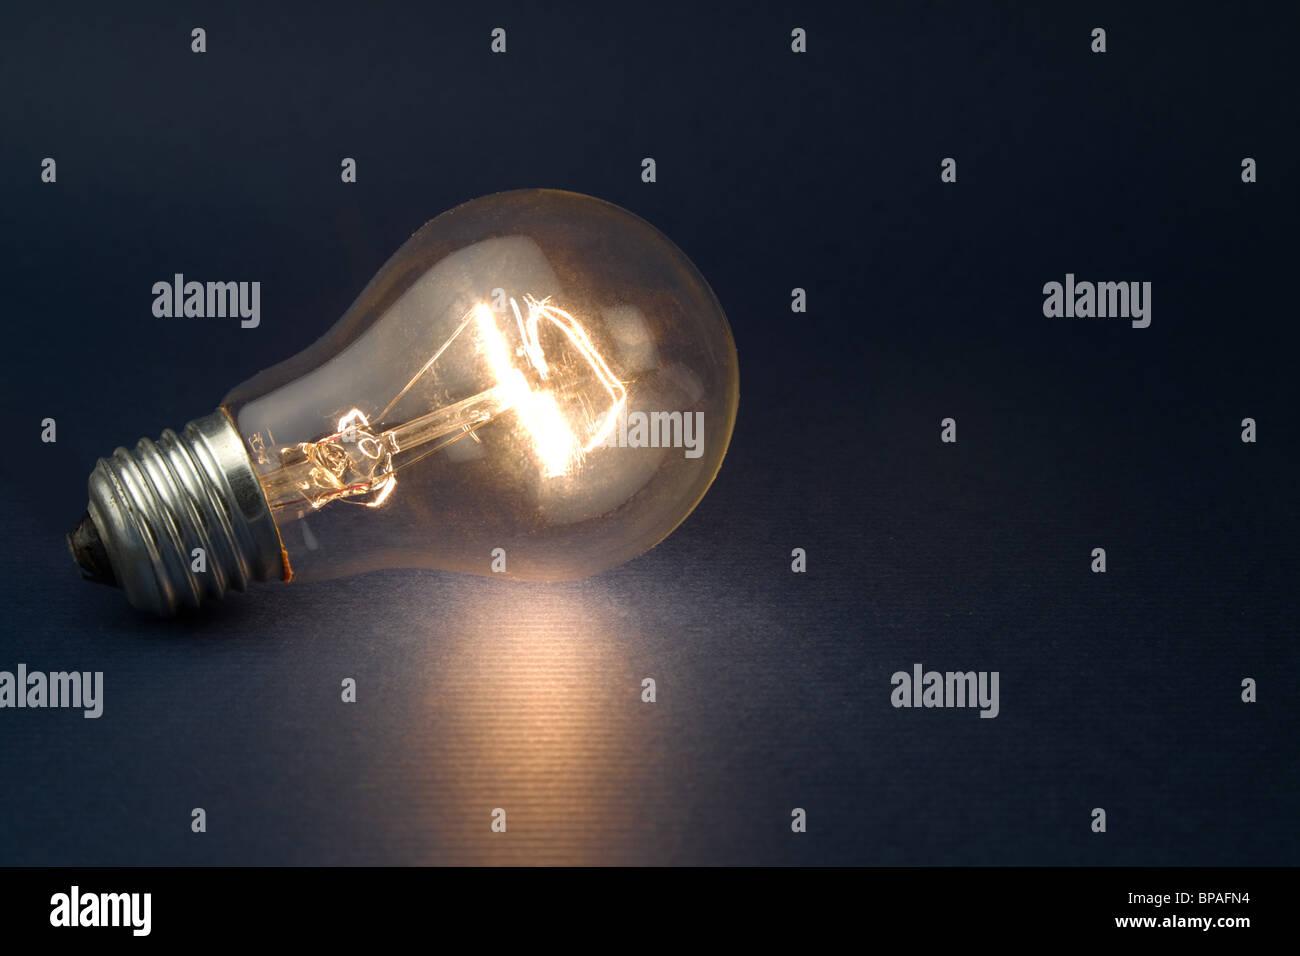 L'Ampoule lumineuse close up shot Photo Stock